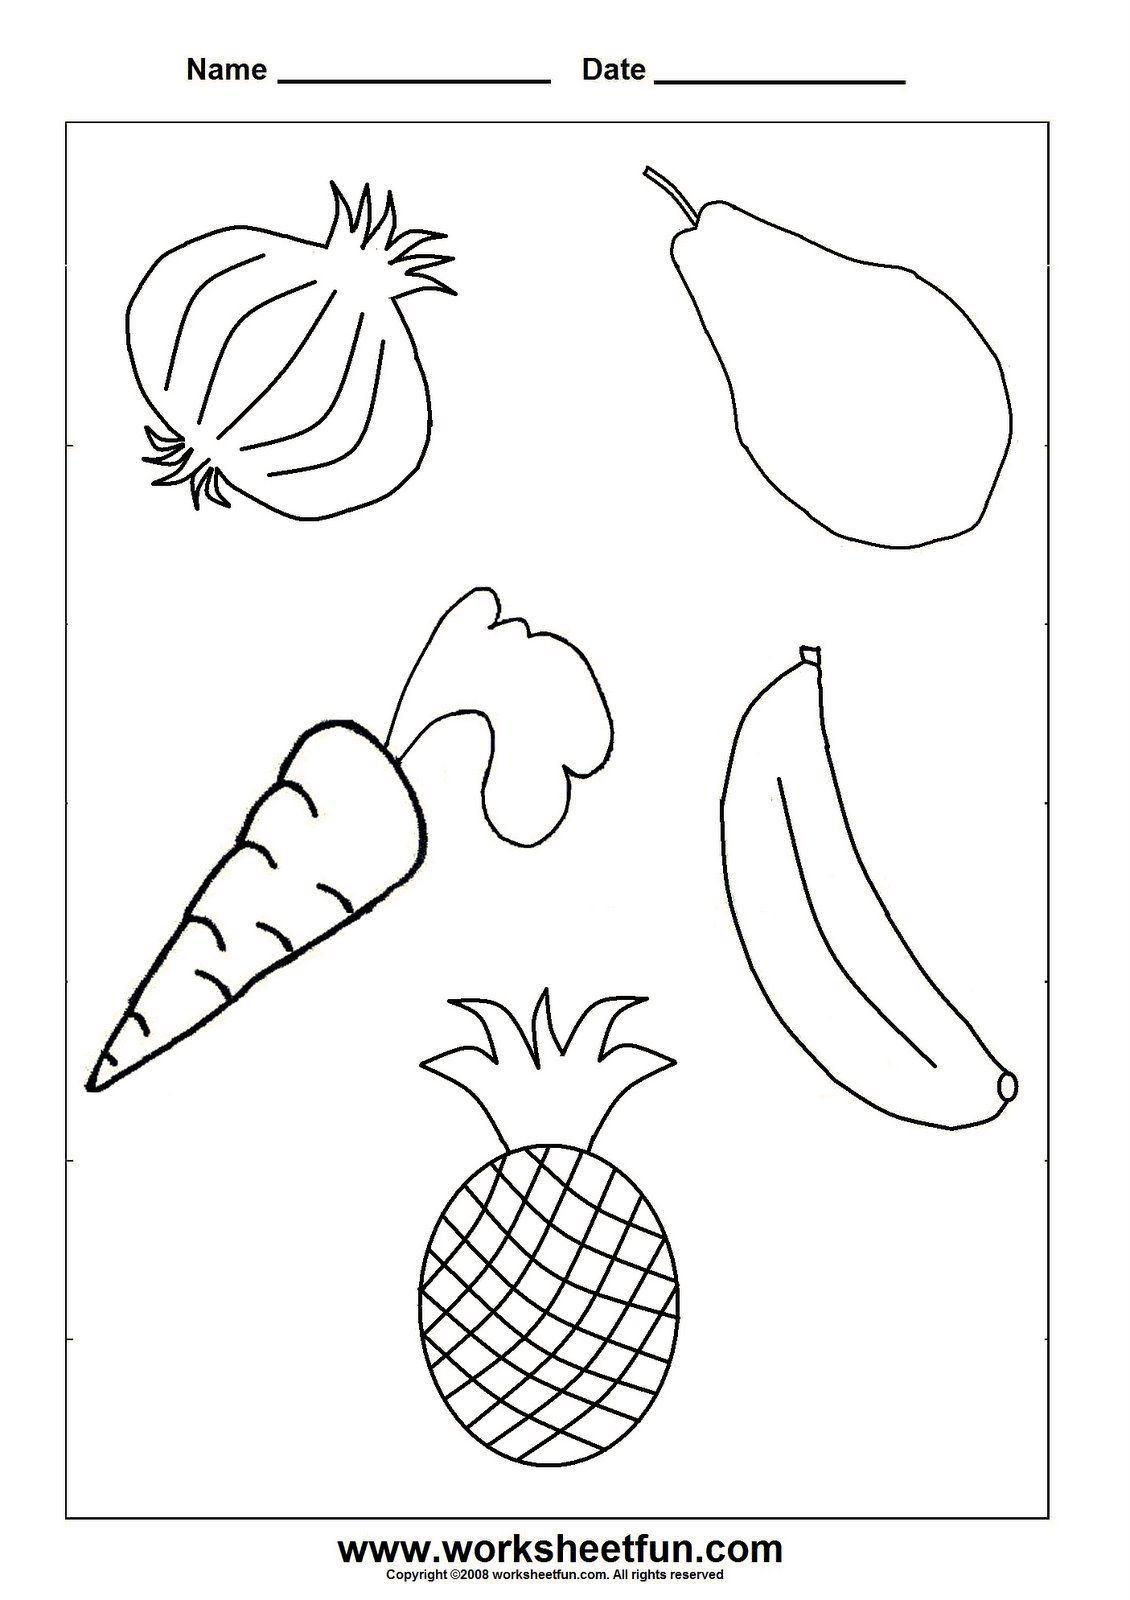 Vegetables Worksheet For Kindergarten Worksheet For Kindergarten Kindergarten Worksheets Kindergarten Worksheets Printable Worksheets For Kids [ 1600 x 1130 Pixel ]